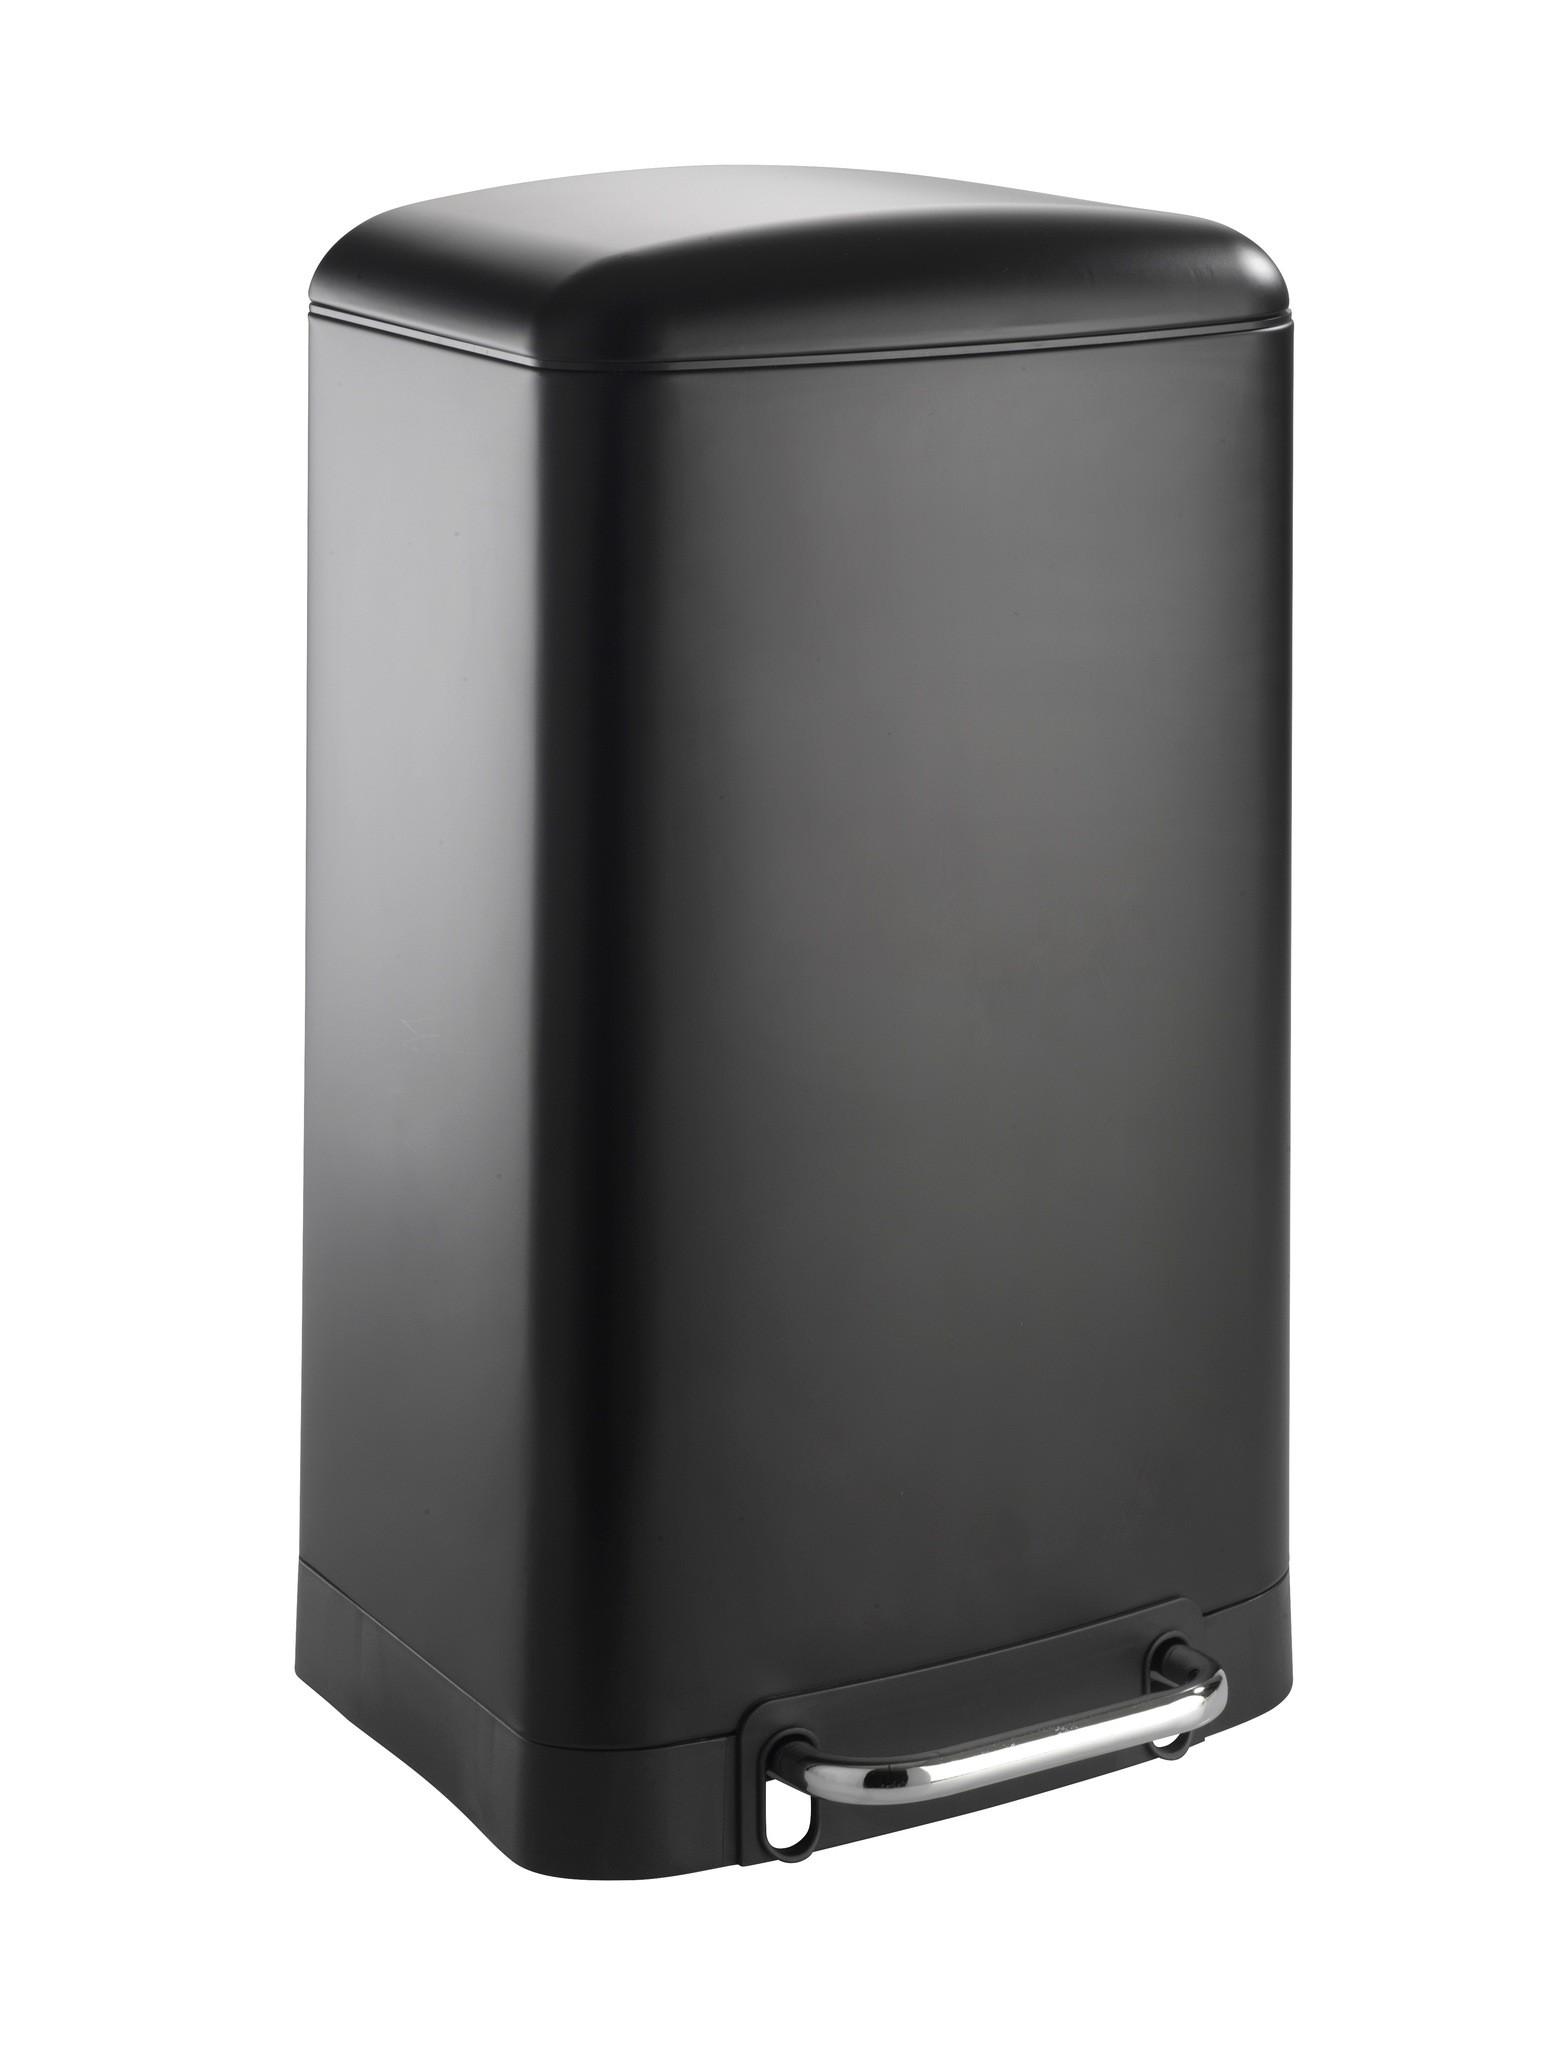 Treteimer Studio Easy-Close Schwarz 30 Liter, Absenkautomatik